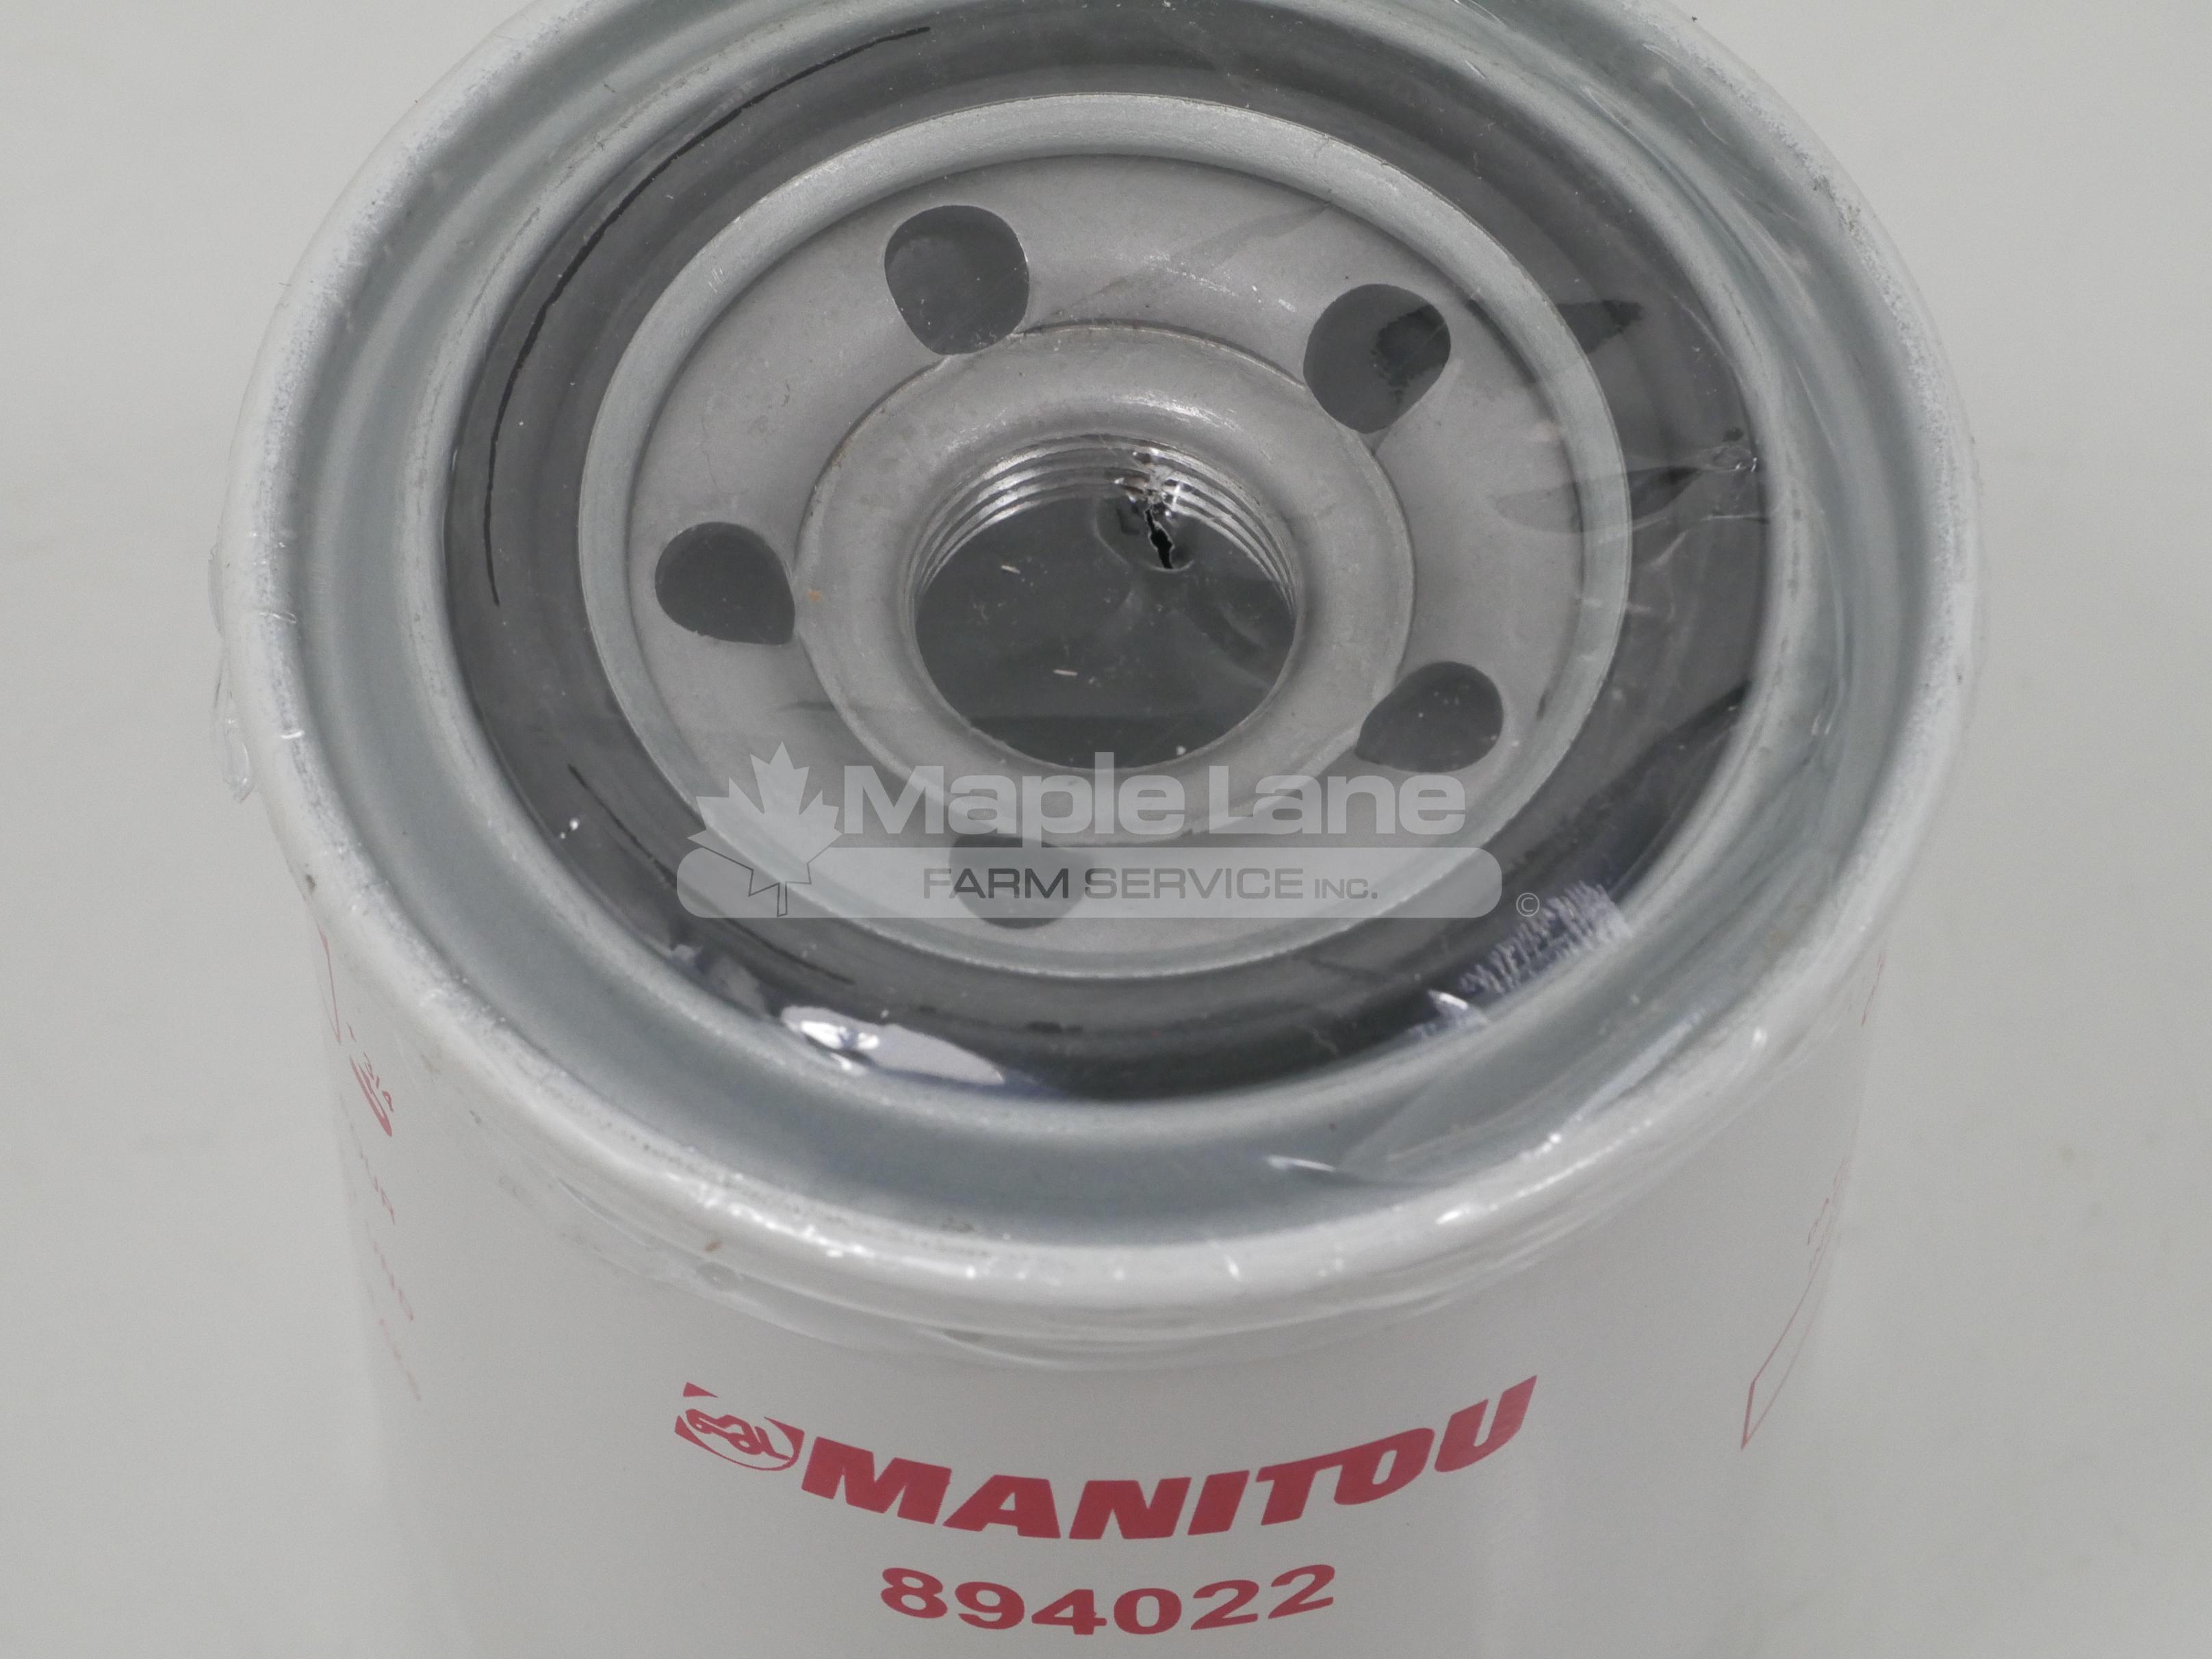 j894022 oil filter